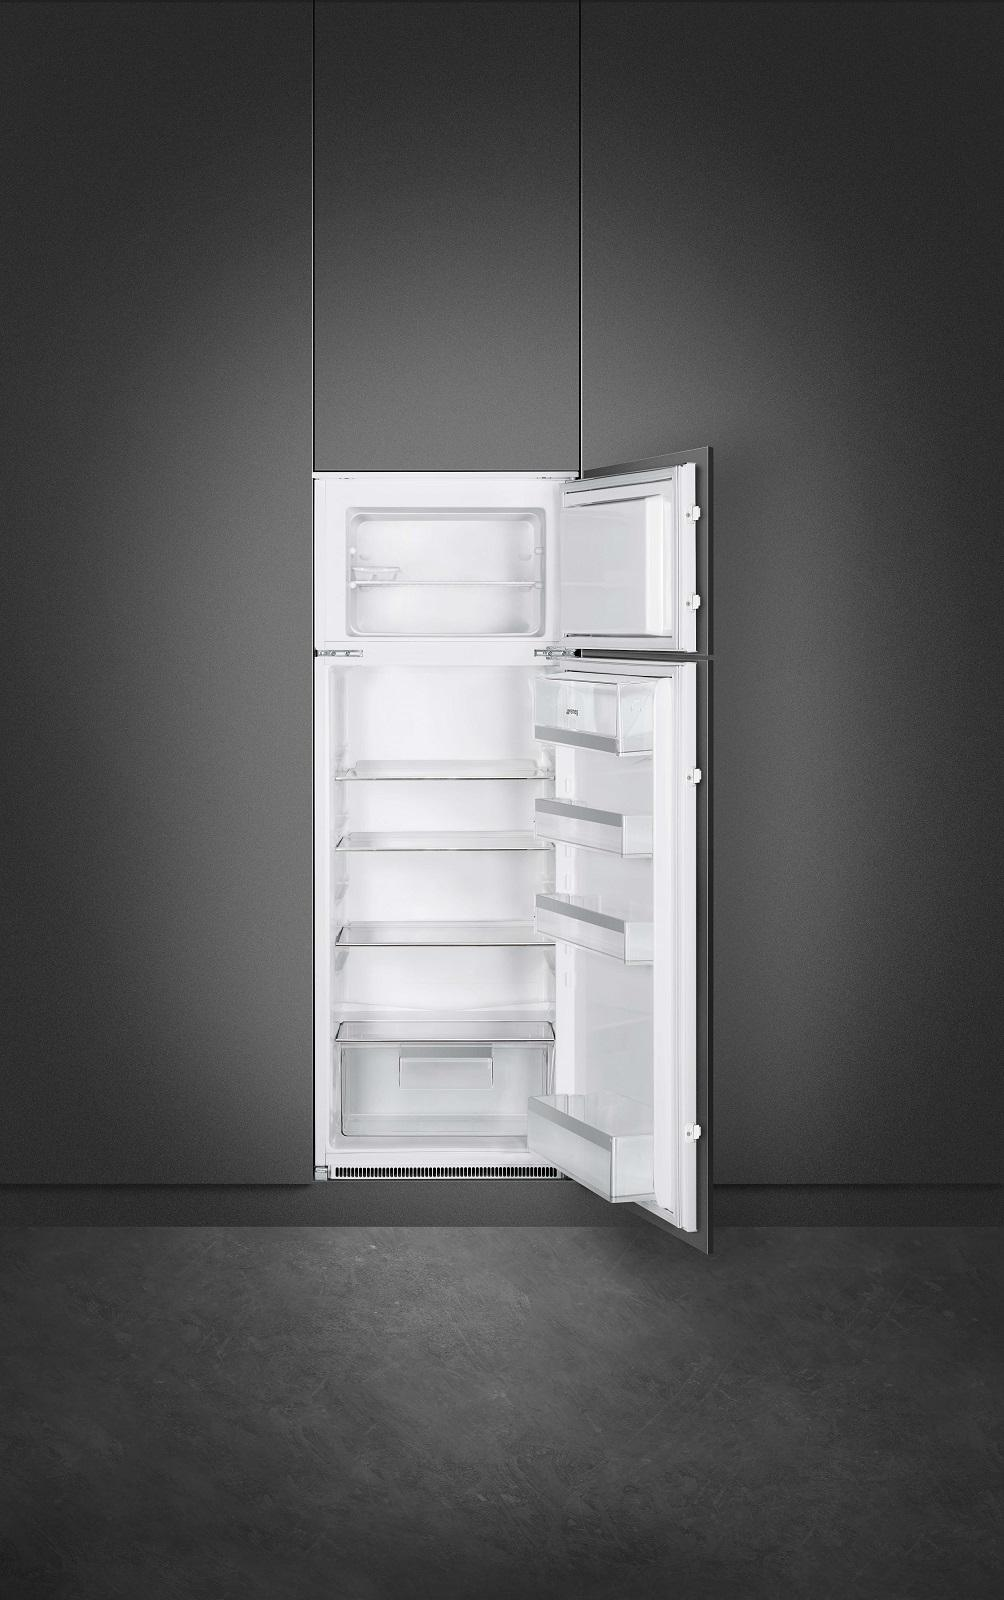 I comuni frigoriferi doppia porta da incasso per stivare - Frigoriferi smeg doppia porta ...